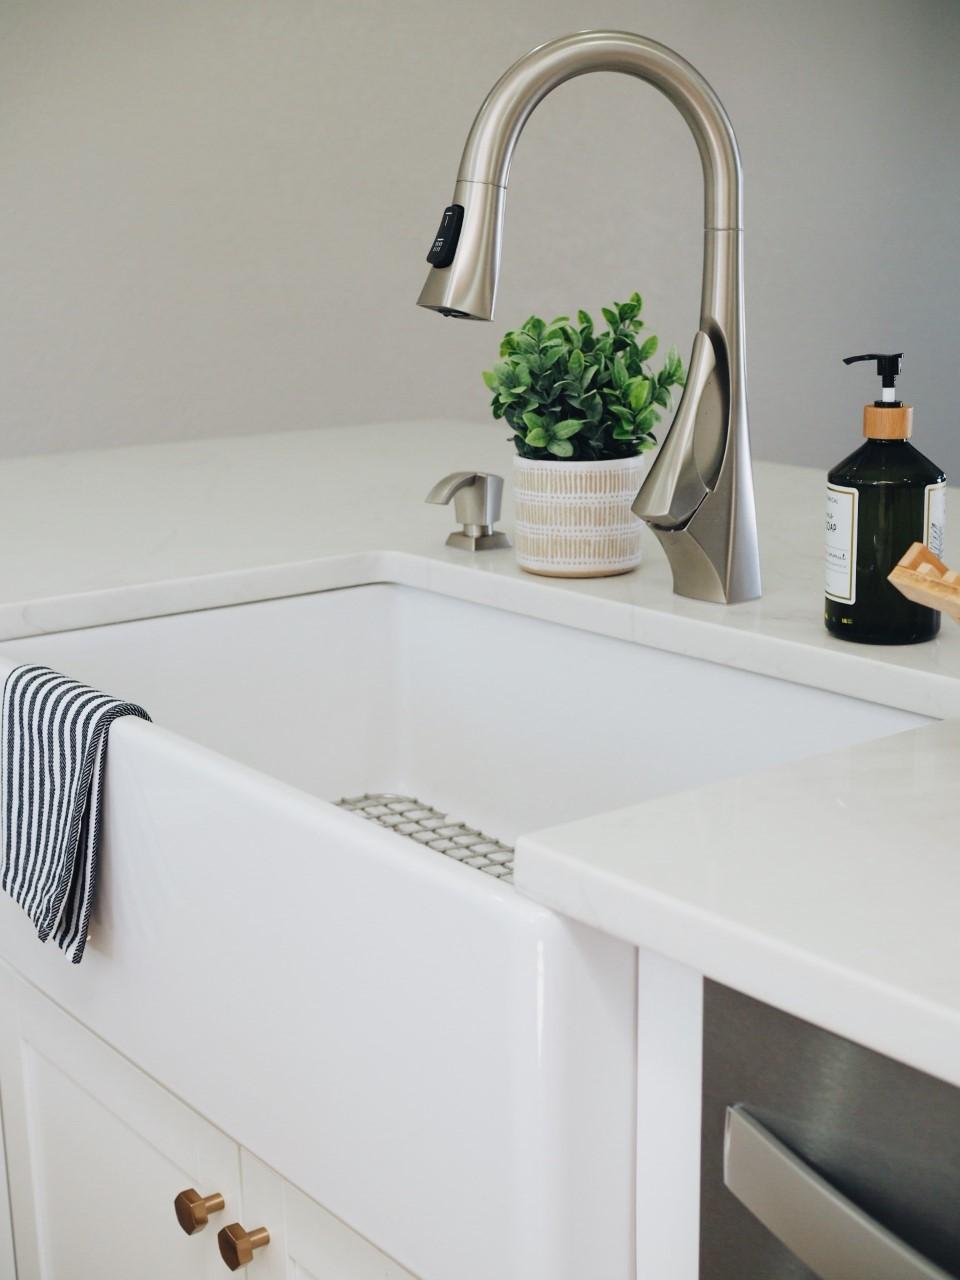 white kitchen home renovation kitchen renovation farmhouse sink single basin sink brass hardware white cabinets double island kitchen